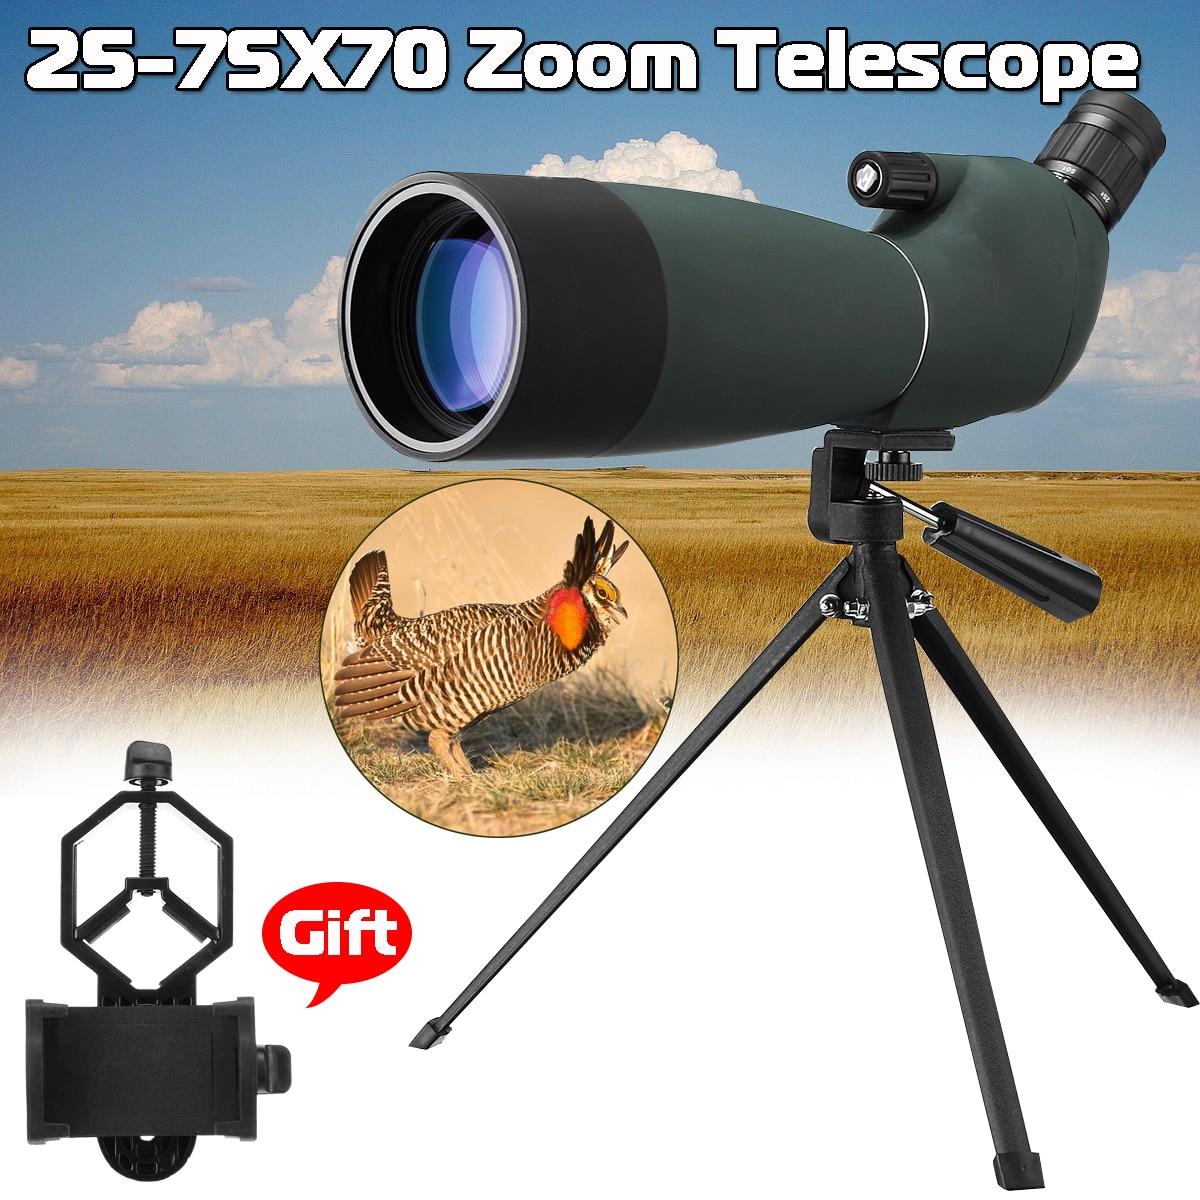 Outdoor 25-75x70 BAK4 Telescope Monocular Waterproof Zoom Spotting Scope binoculars with Tripod Phone Holder Hunting Optic Scope все цены